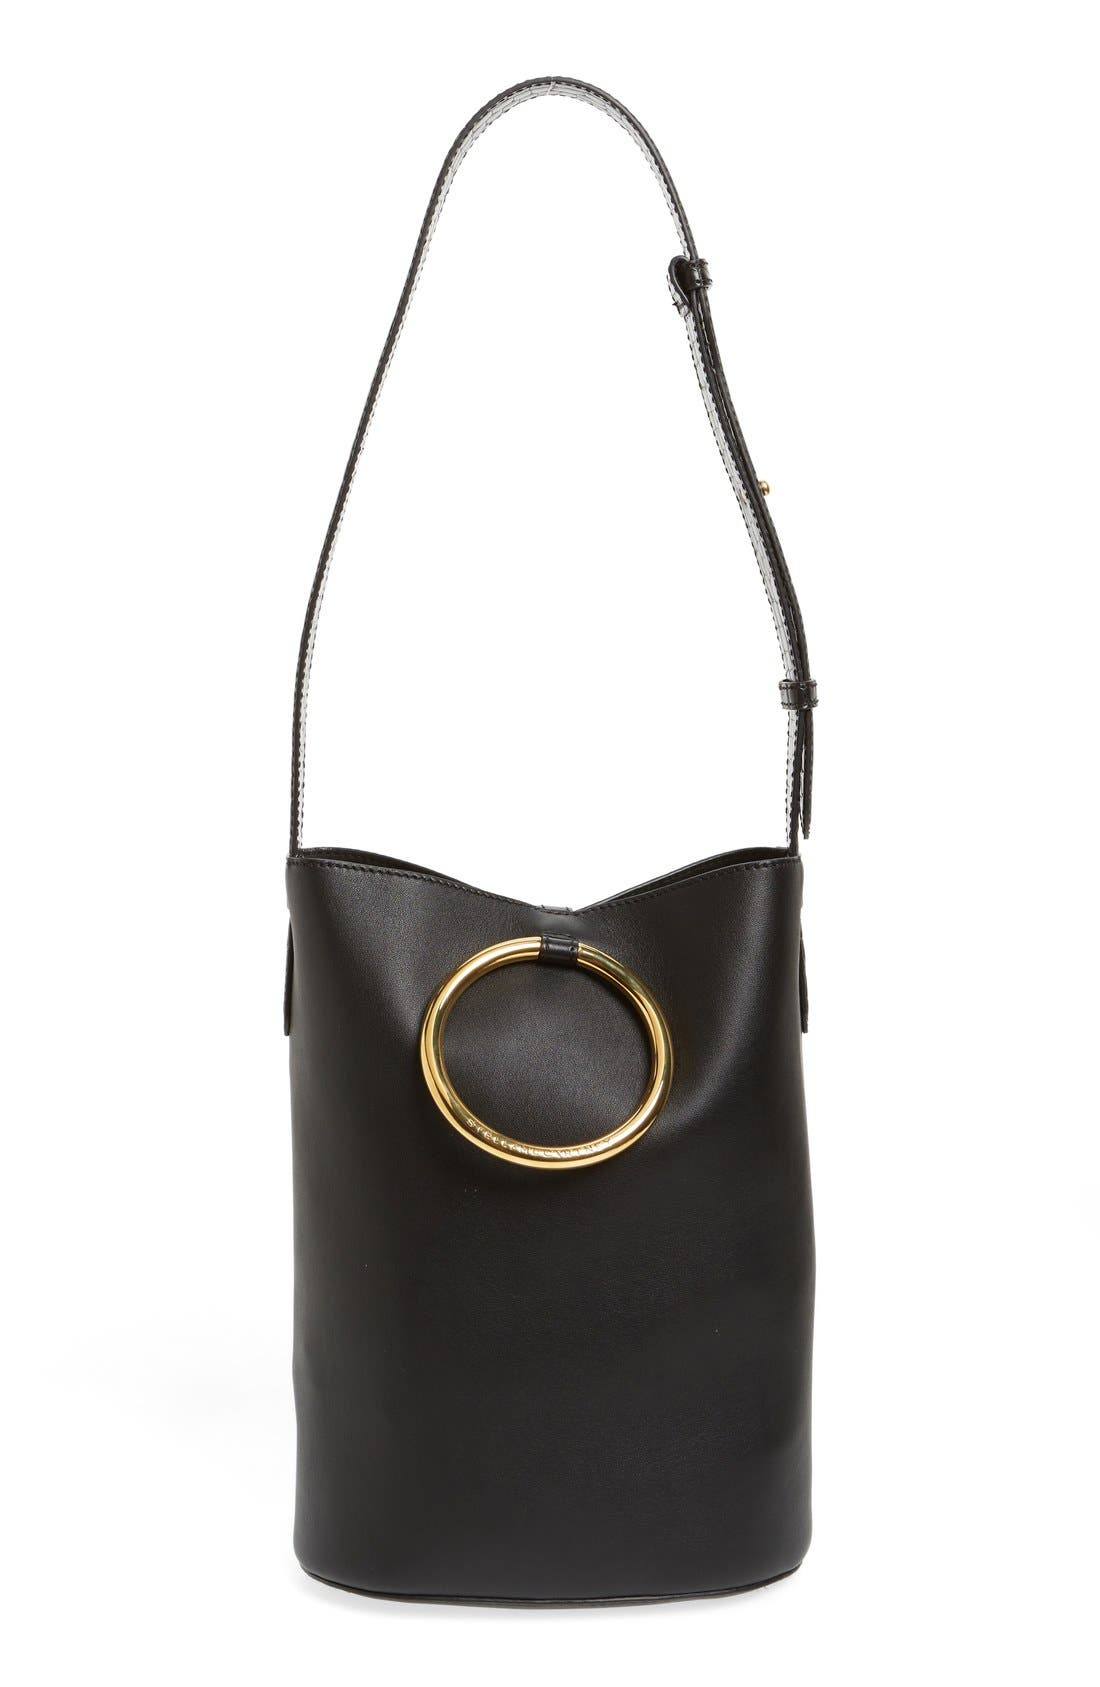 Main Image - Stella McCartney 'Medium Ring' Faux Nappa Leather Bucket Bag